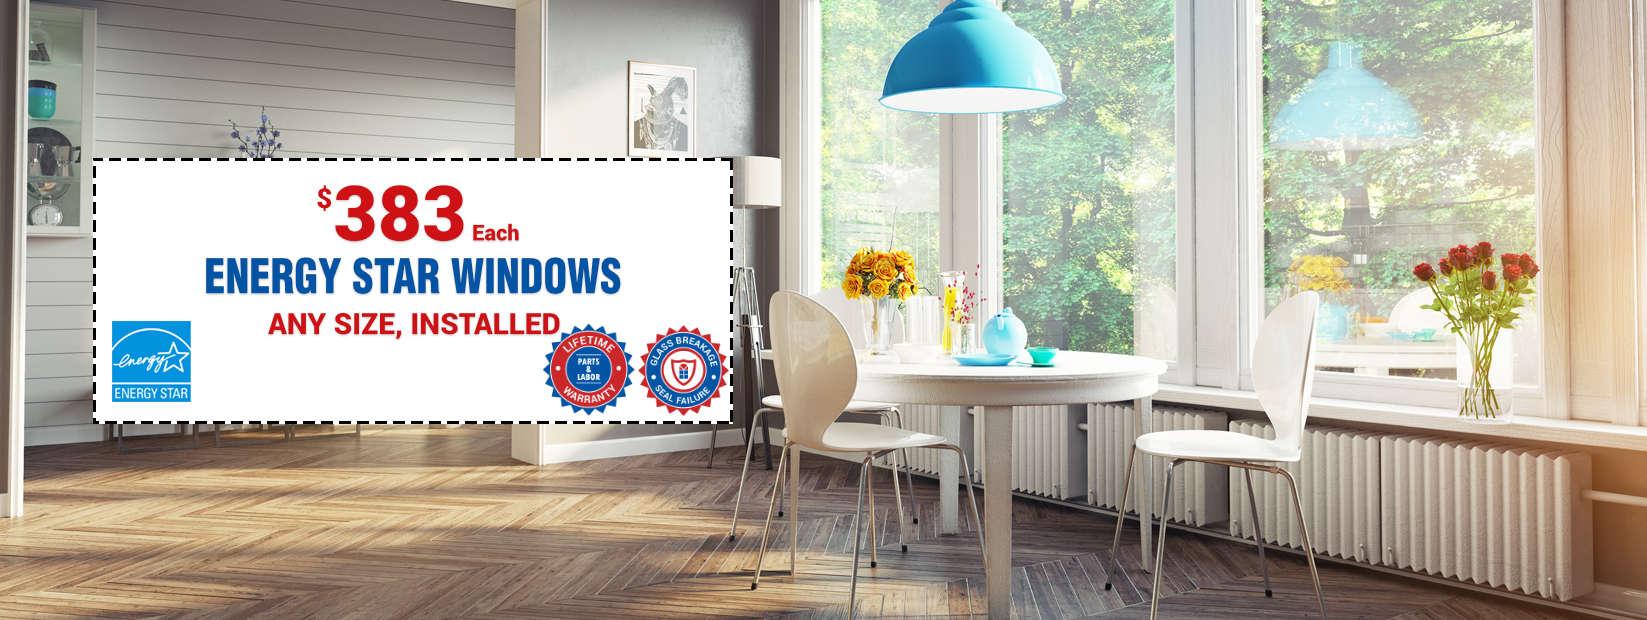 Energy Efficient Windows Boston MA